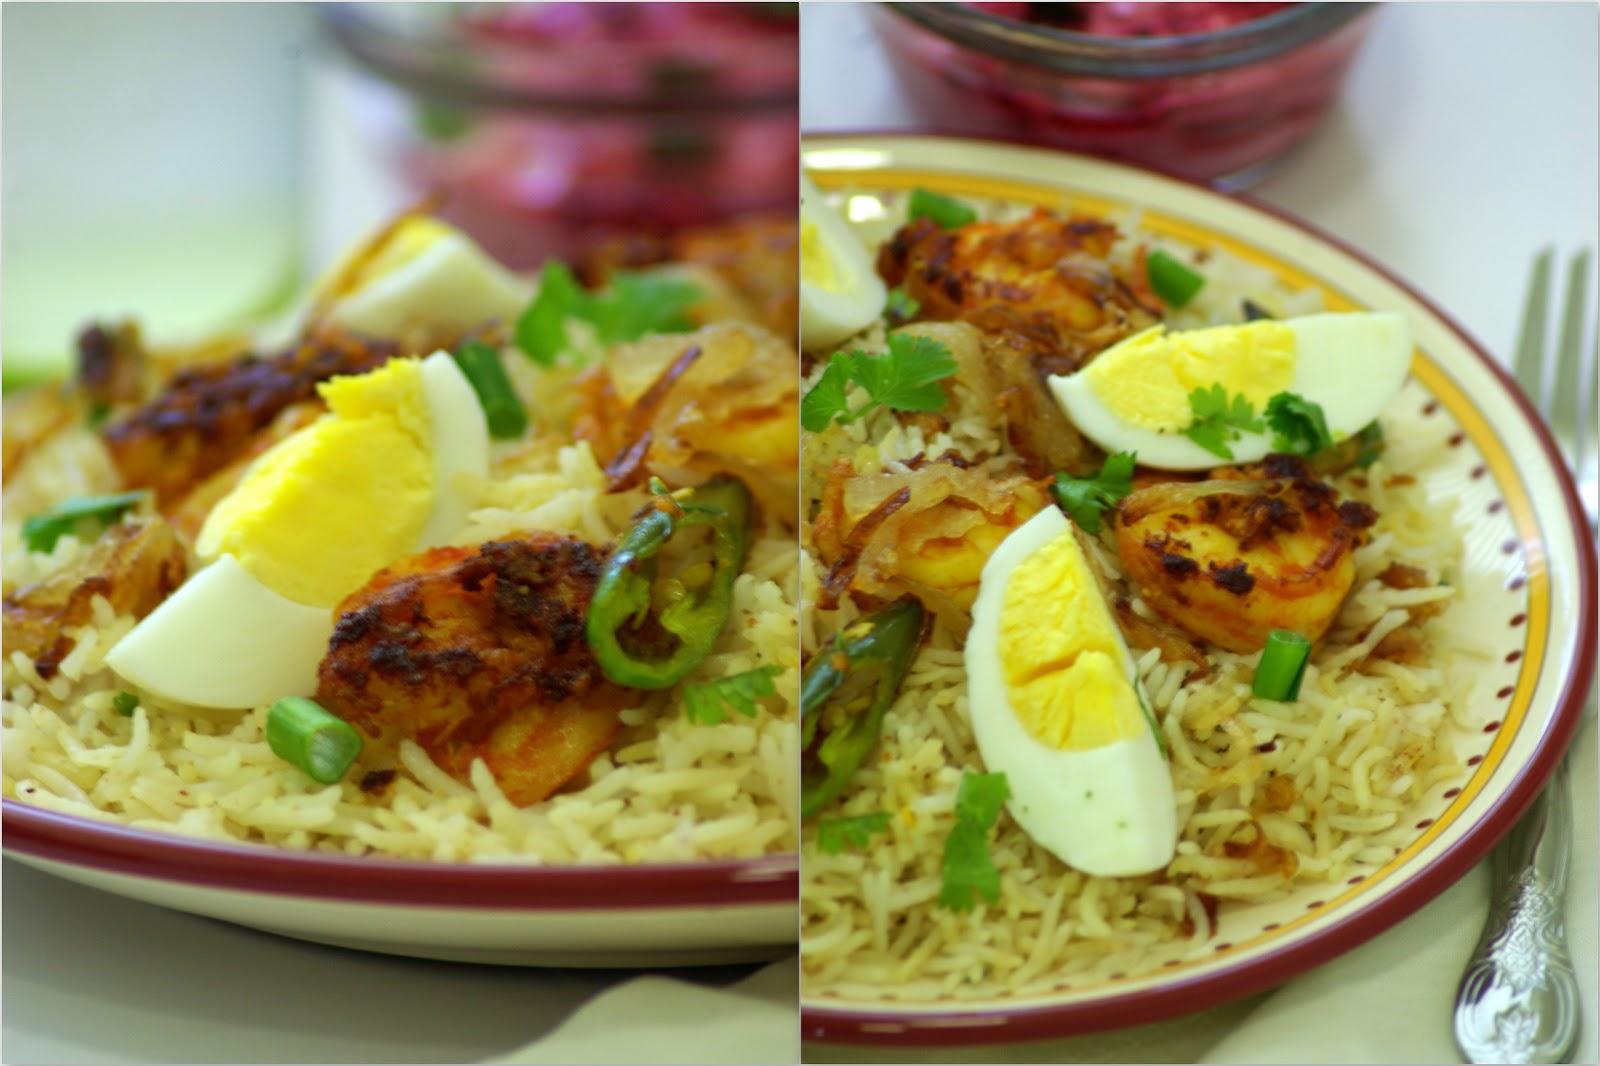 Shrimp pilaf shrimp with rice recipe lunch ideas for Sunday lunch ideas